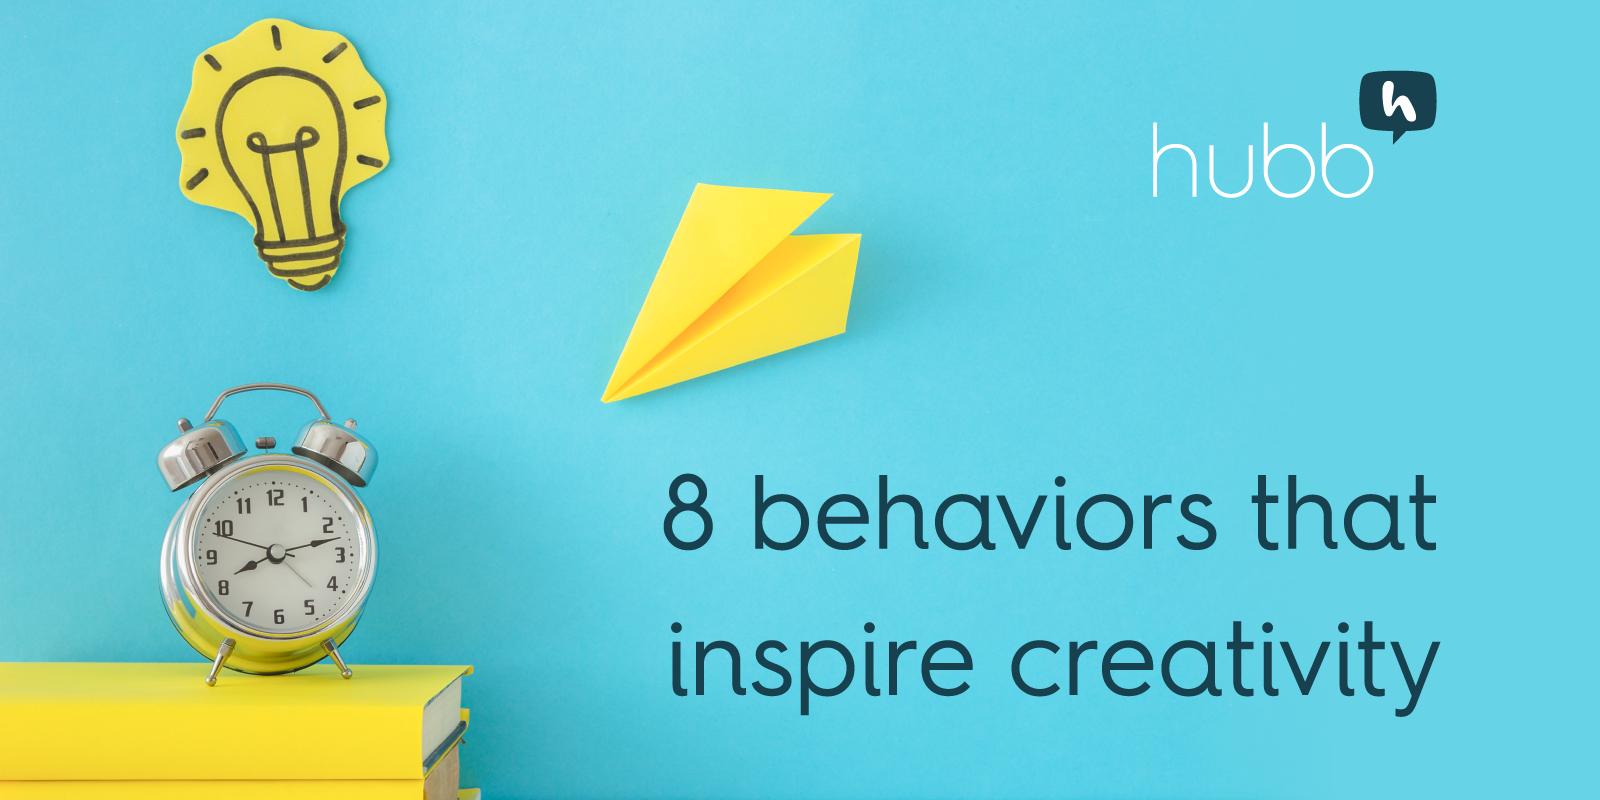 8-behaviors-that-inspire-creativity-Social